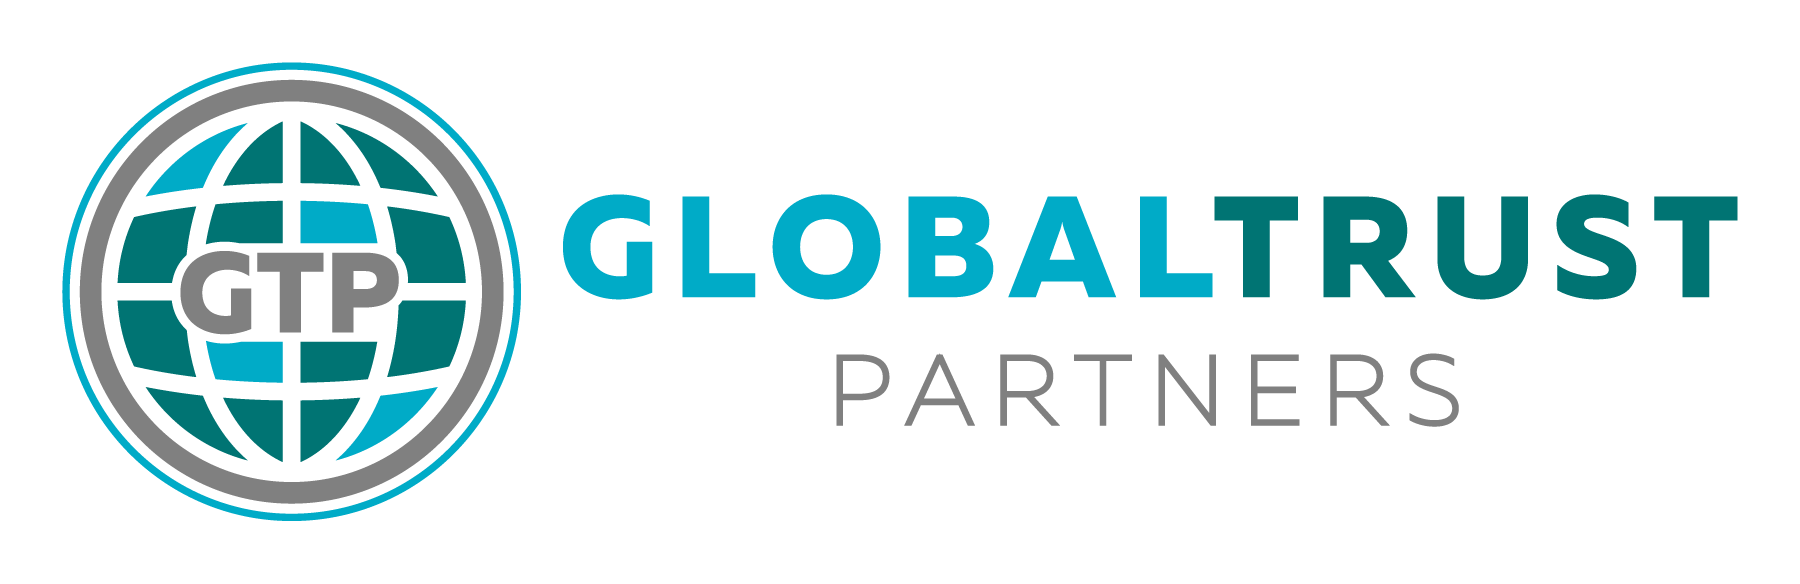 gtp-logo-text-horizontal